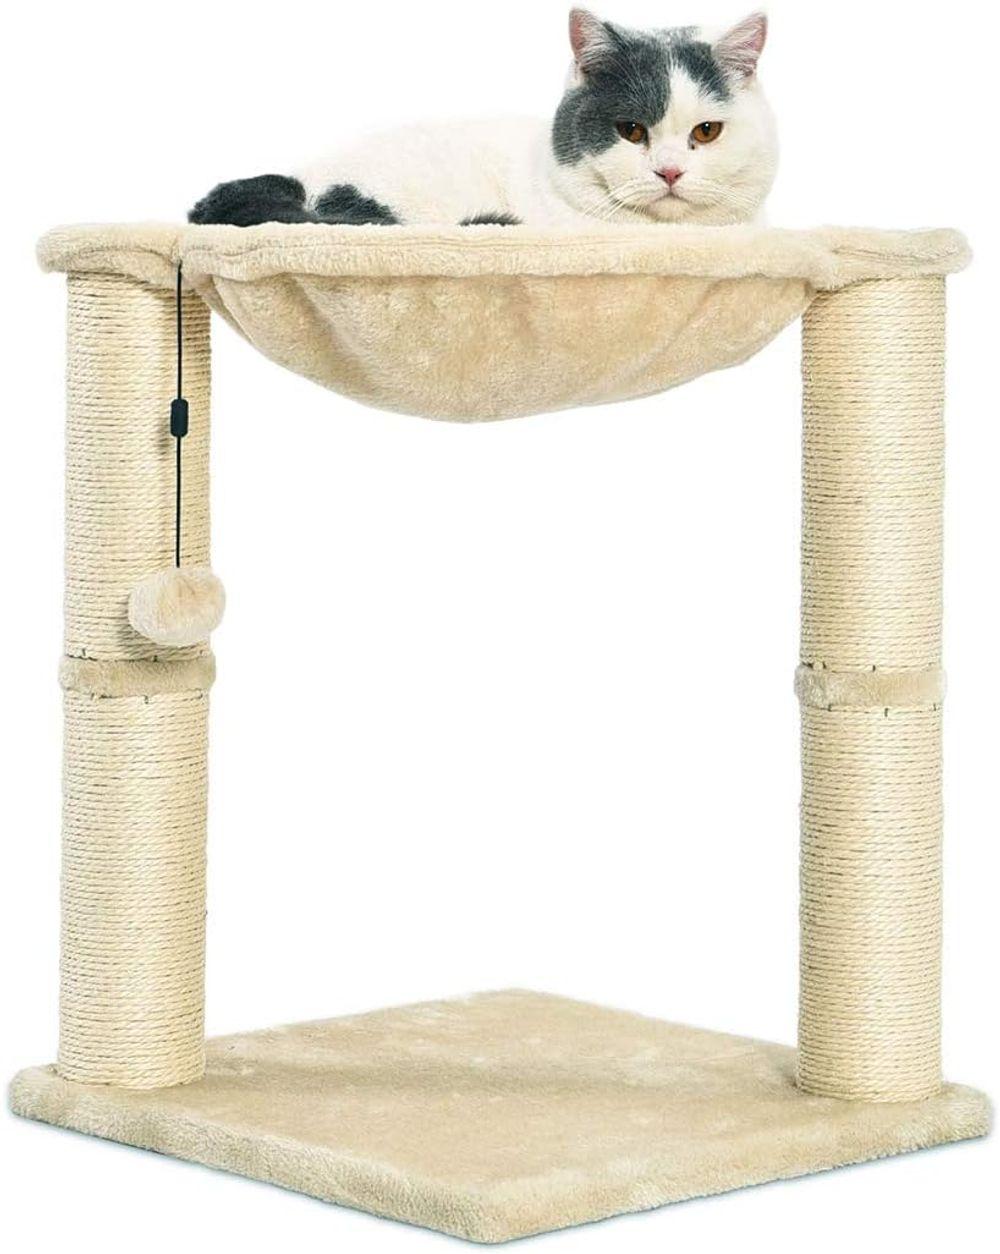 Basics Cat Scratching Post and Hammock